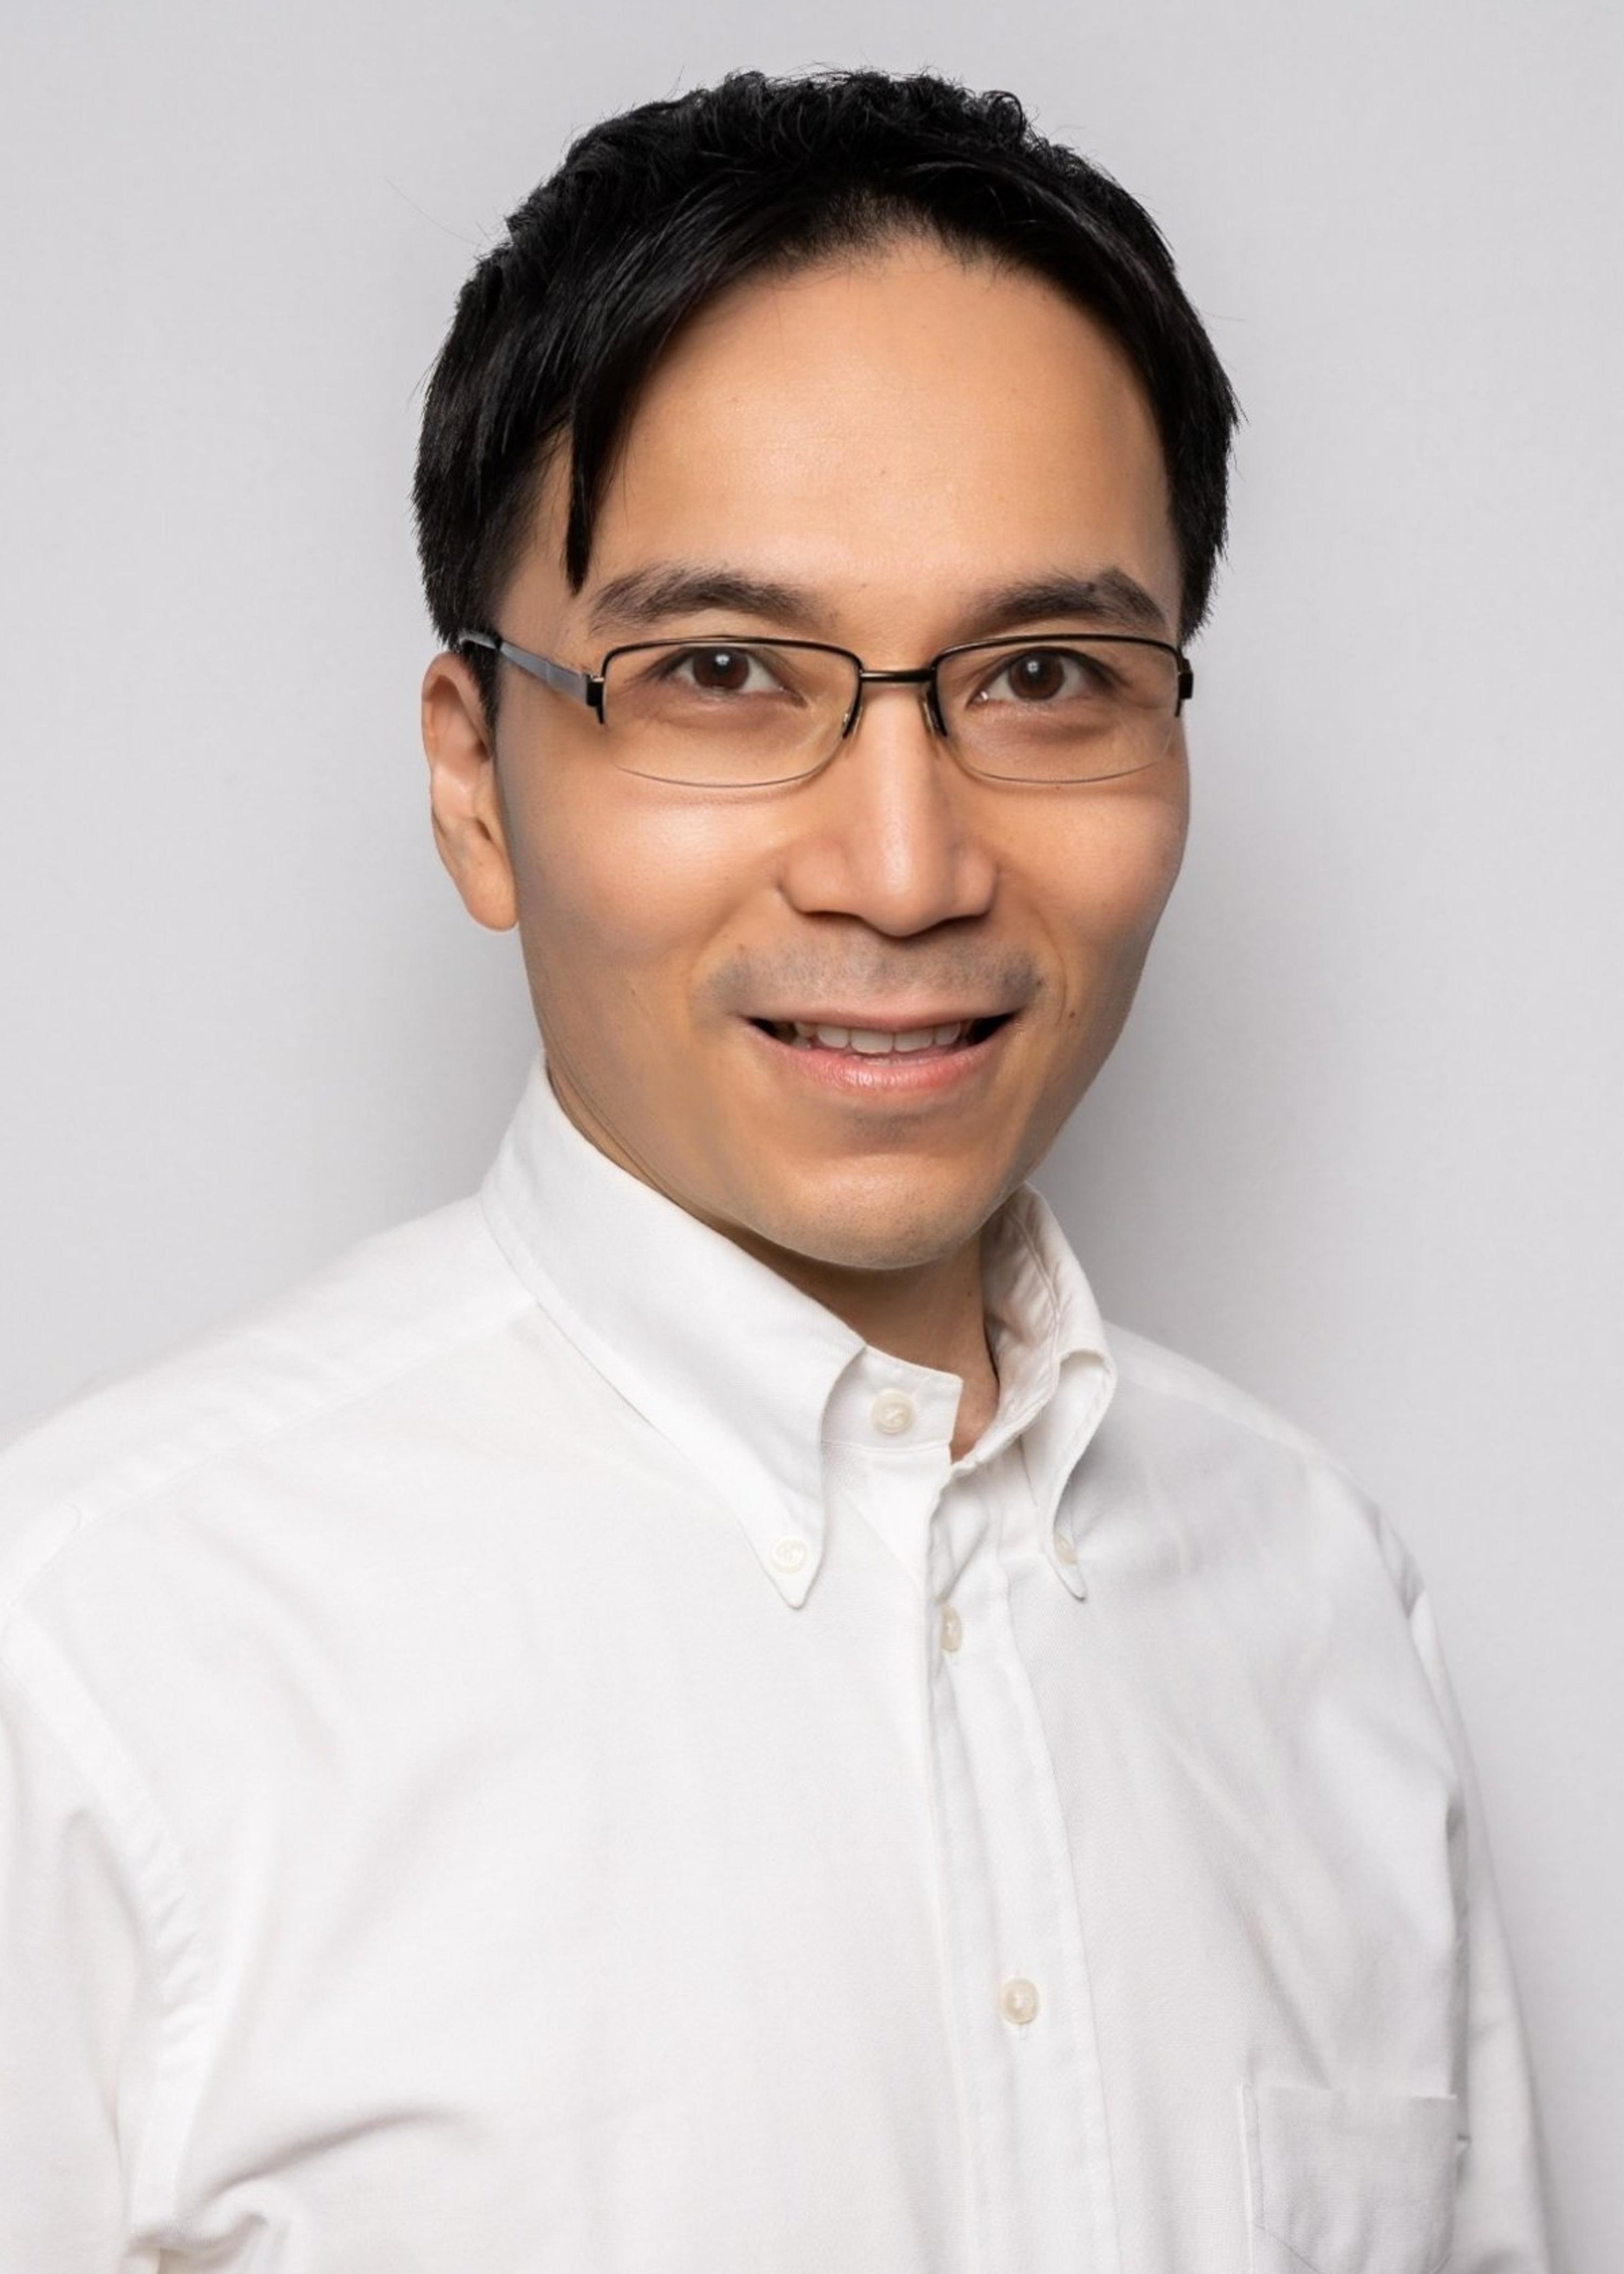 Thomas Fujinaga